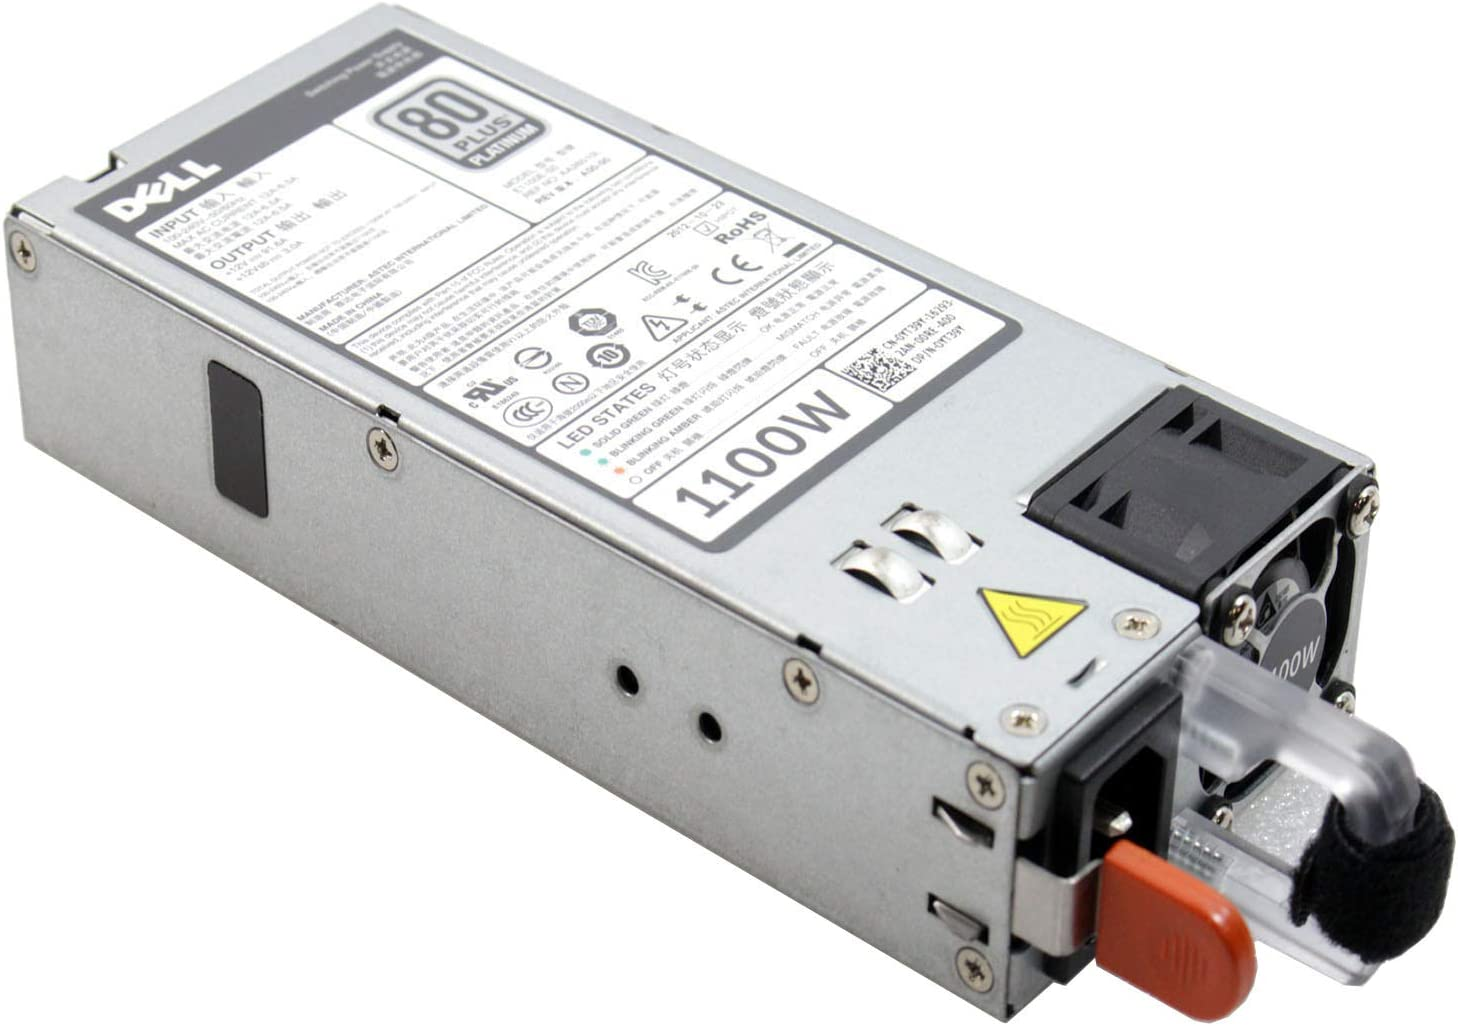 New Dell PowerEdge R520 R620 R720 R720XD San Diego Popular products Mall R820 T420 R920 T320 T62